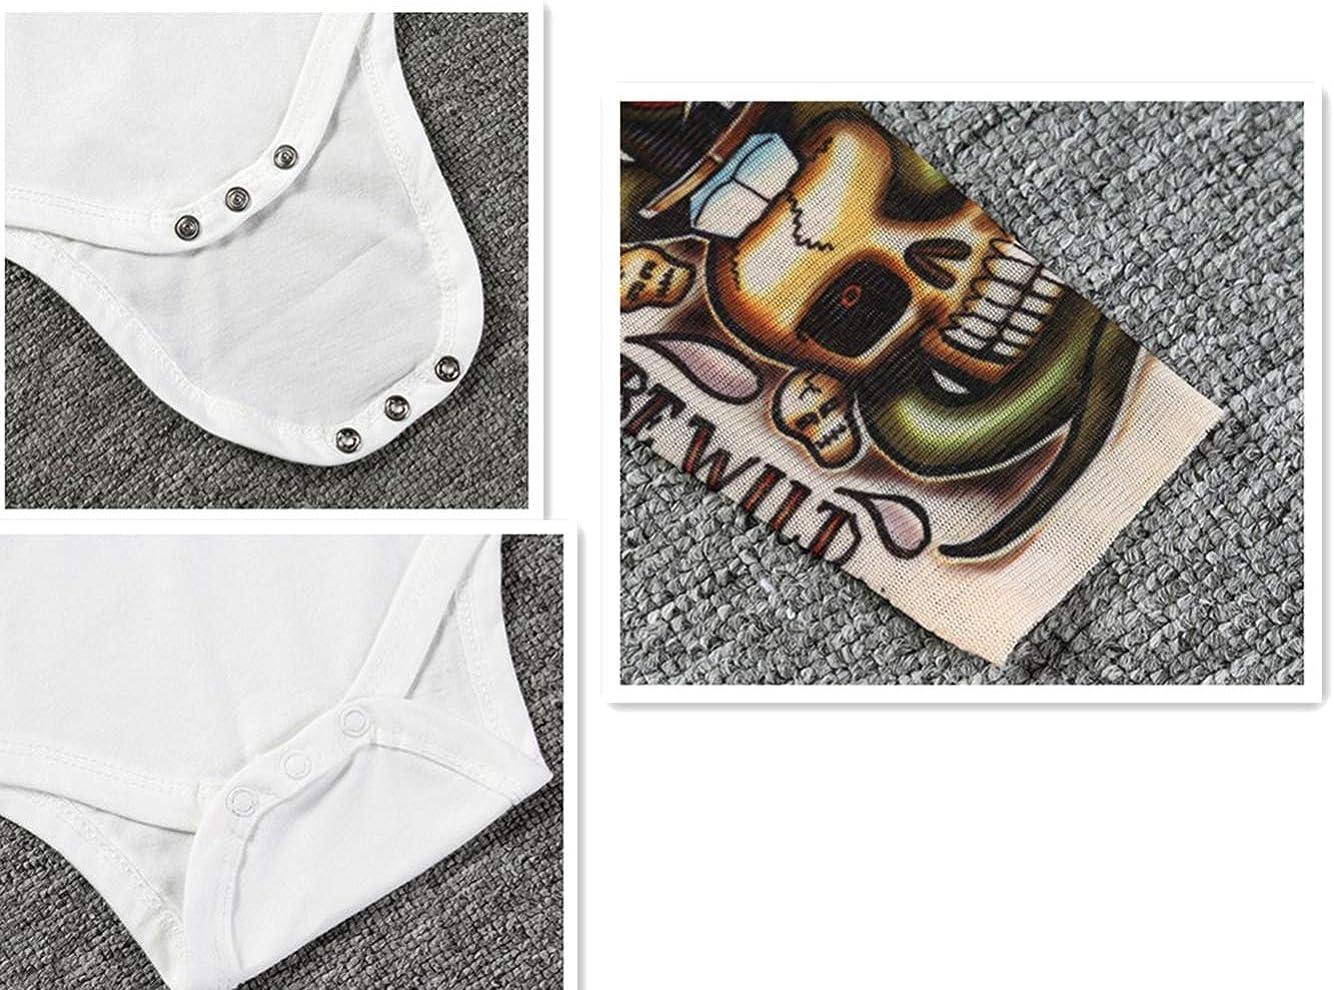 Dintang Familia Adulto Ni/ño Mameluco Infantil Estampado T-Shirt Ropa de Tatuaje Manga Larga Casual